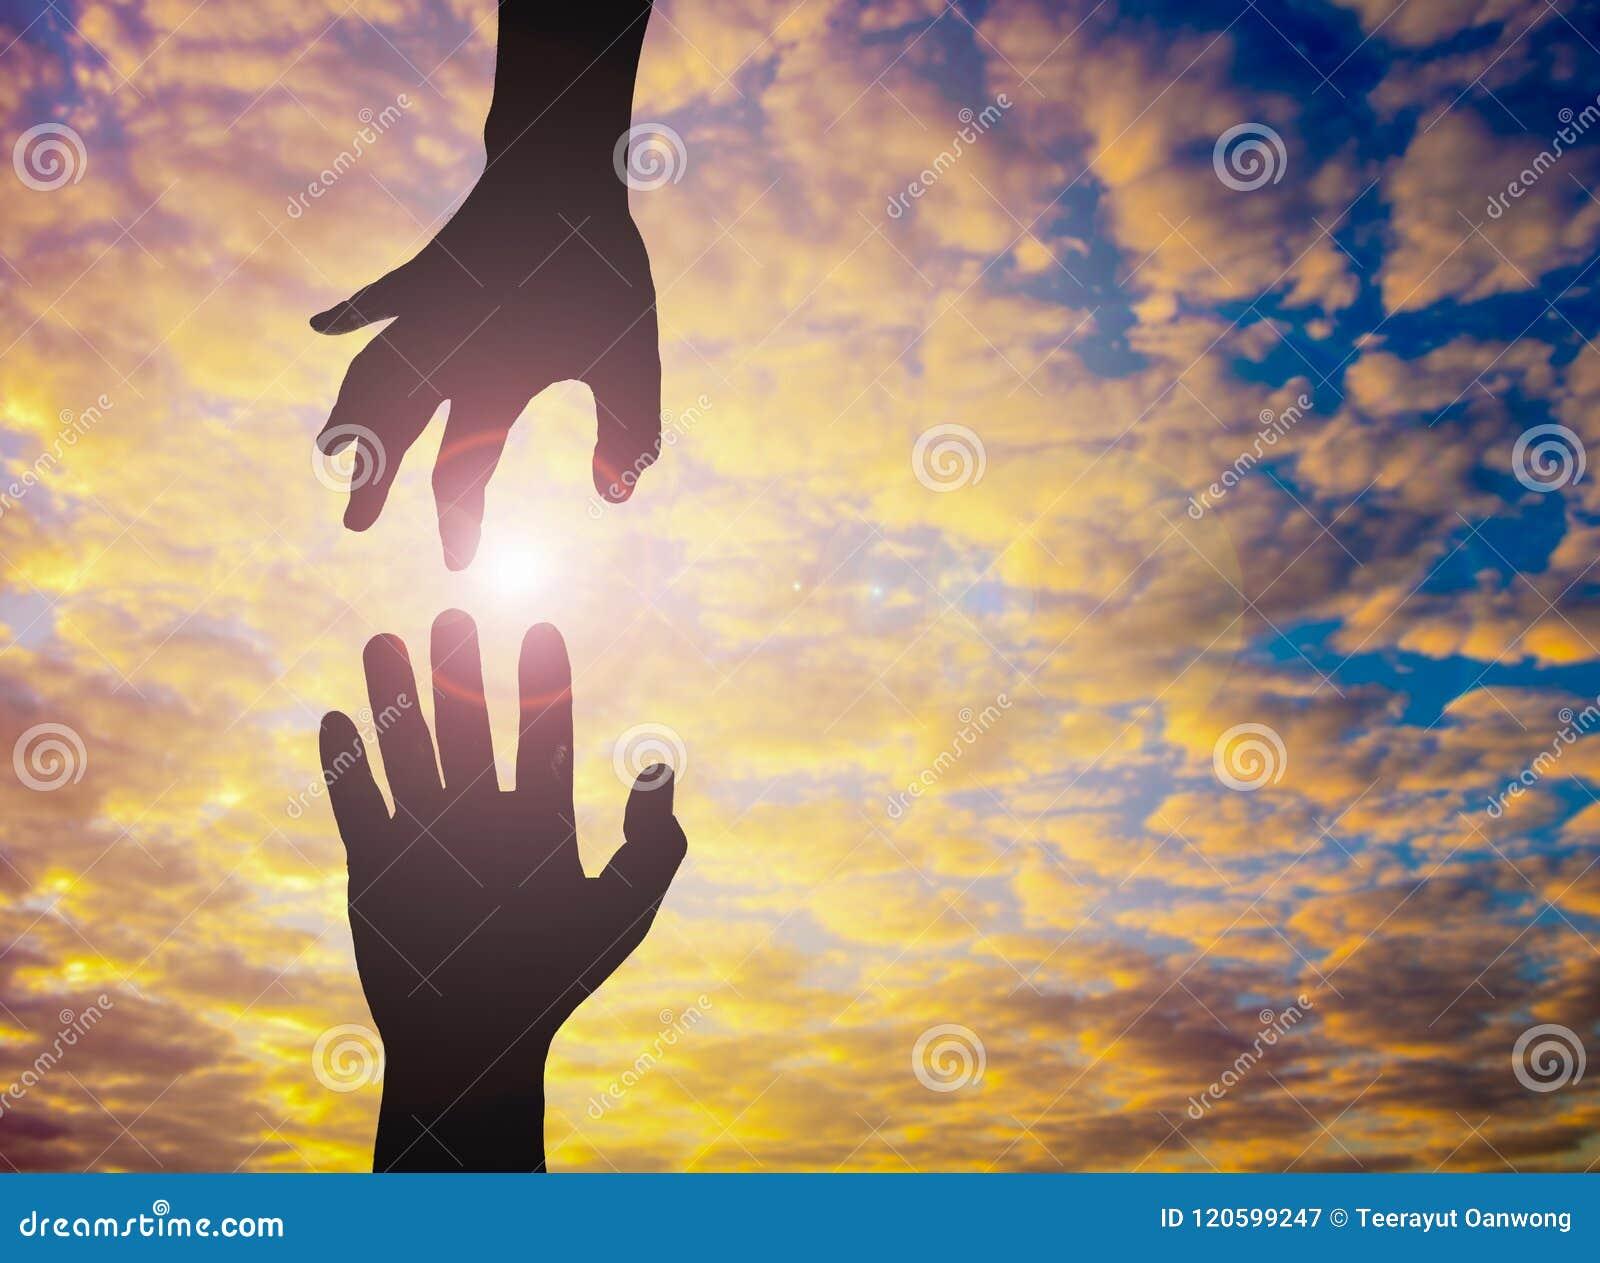 La foto de la silueta de mano a mano